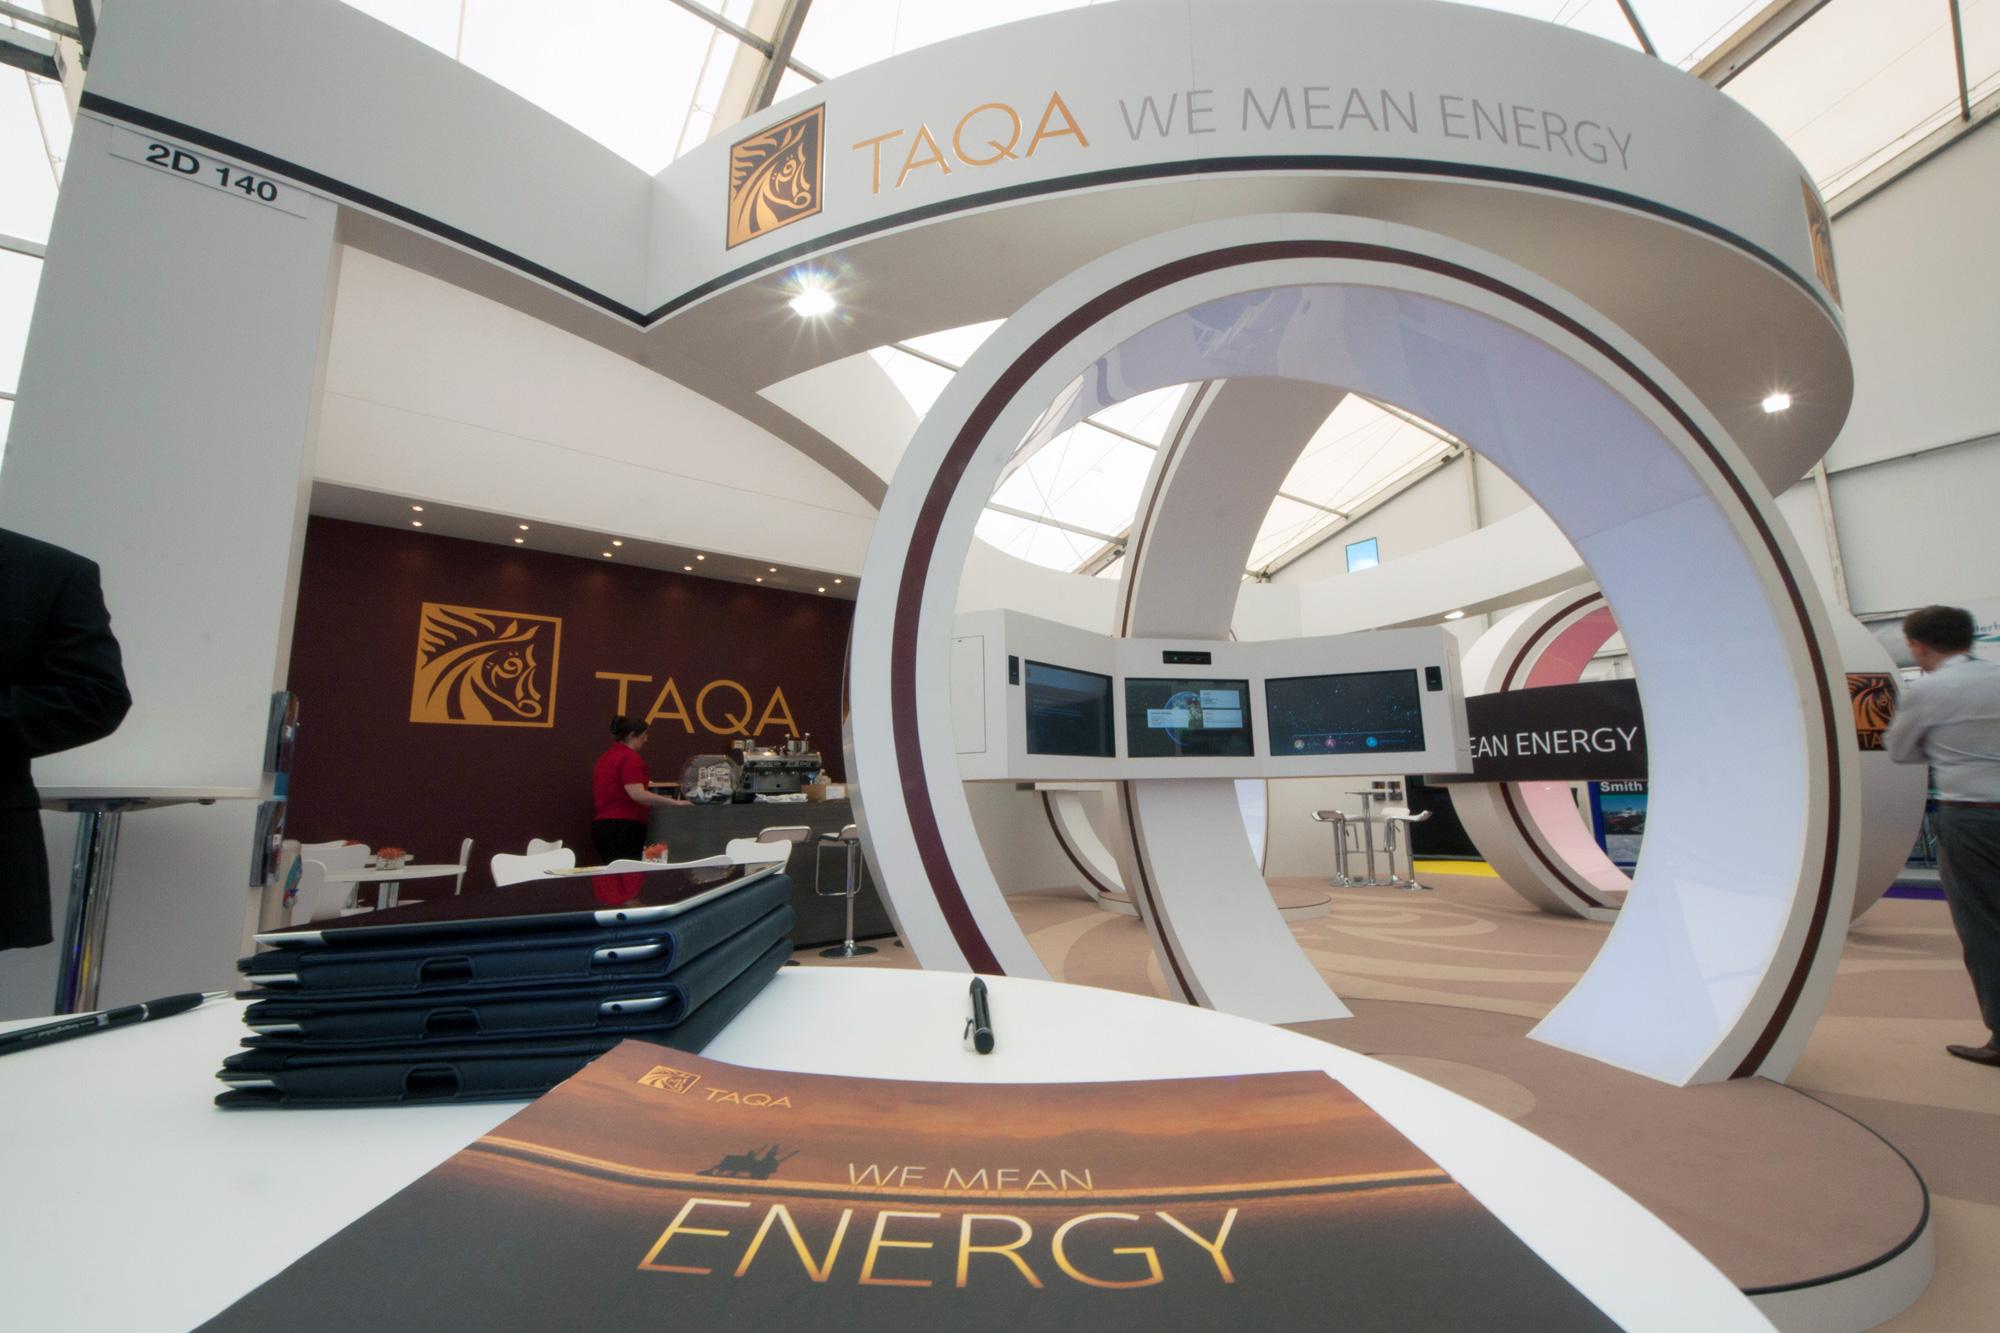 taqa corporate office interior. Exhibition Design For Taqa At Offshore Europe Corporate Office Interior 2